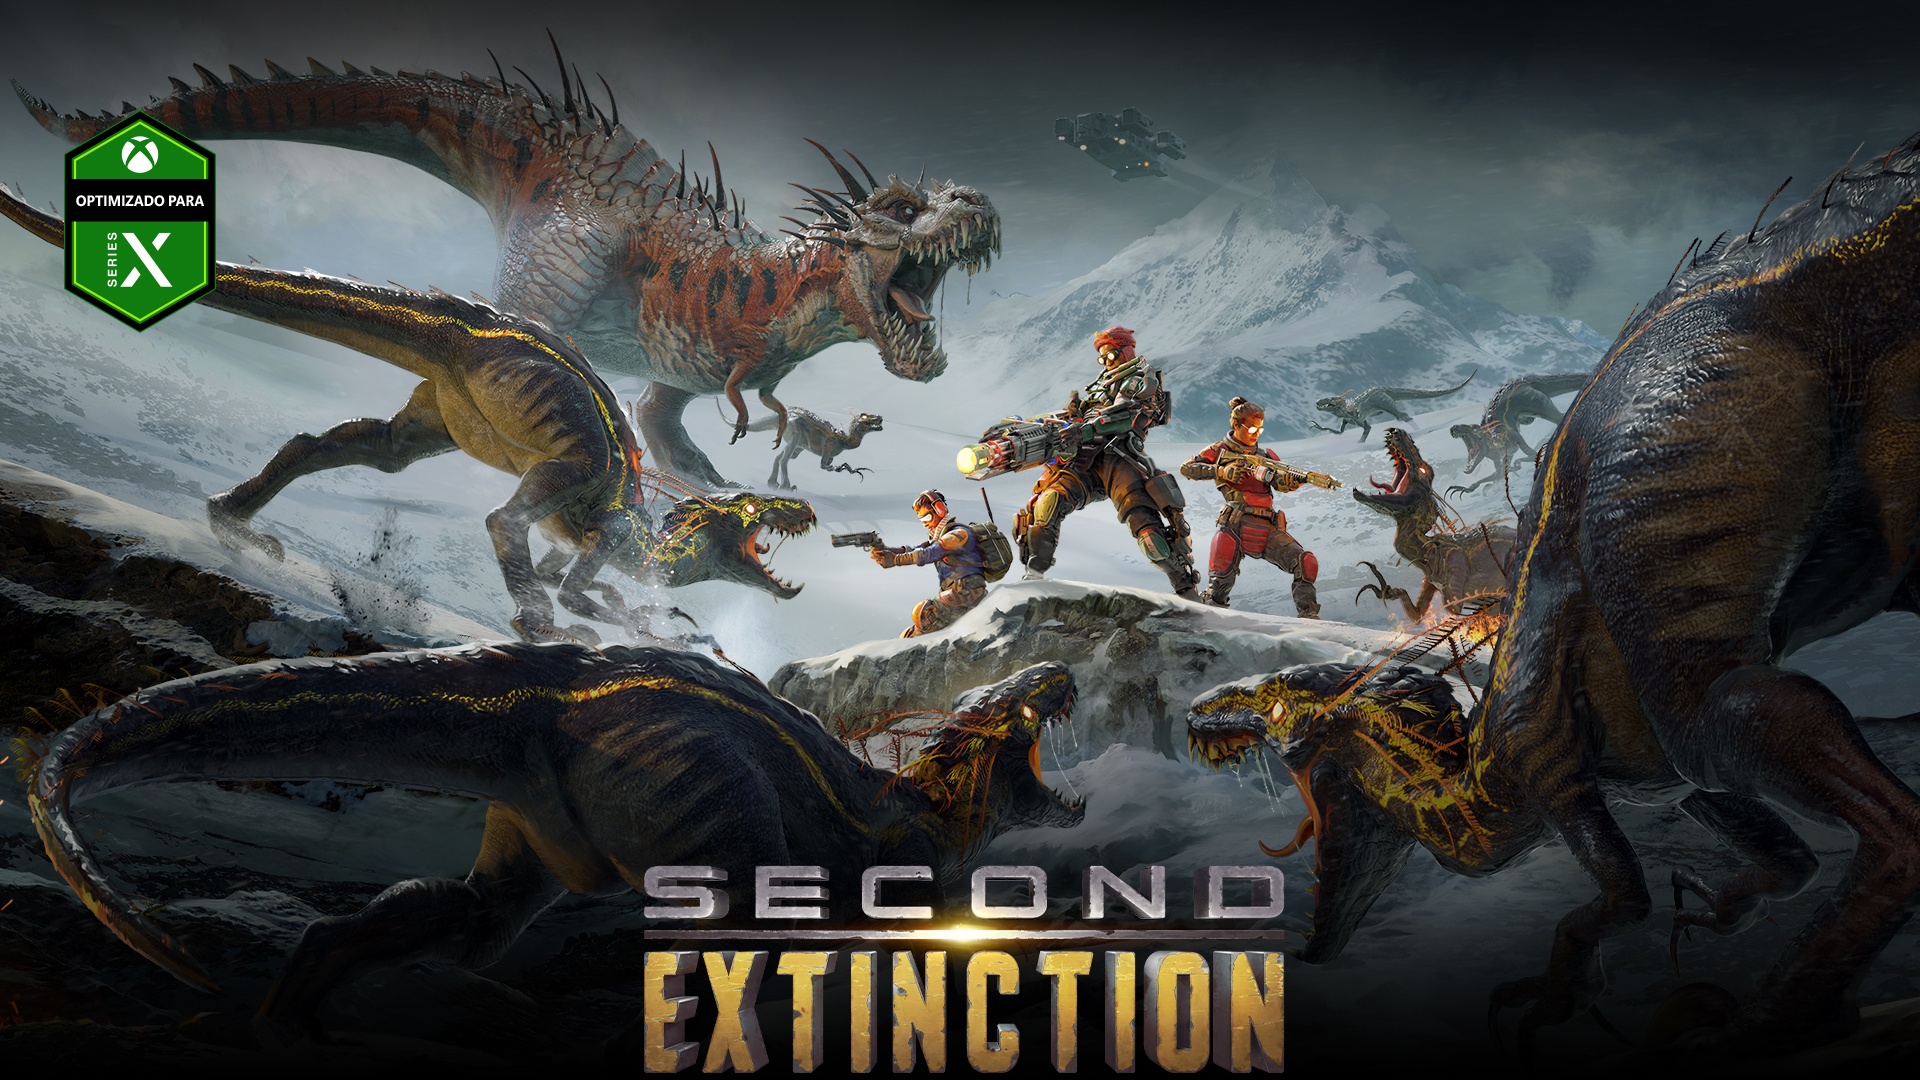 Second Extinction, Optimizada para Series X, un grupo de personajes lucha contra un grupo de dinosaurios.